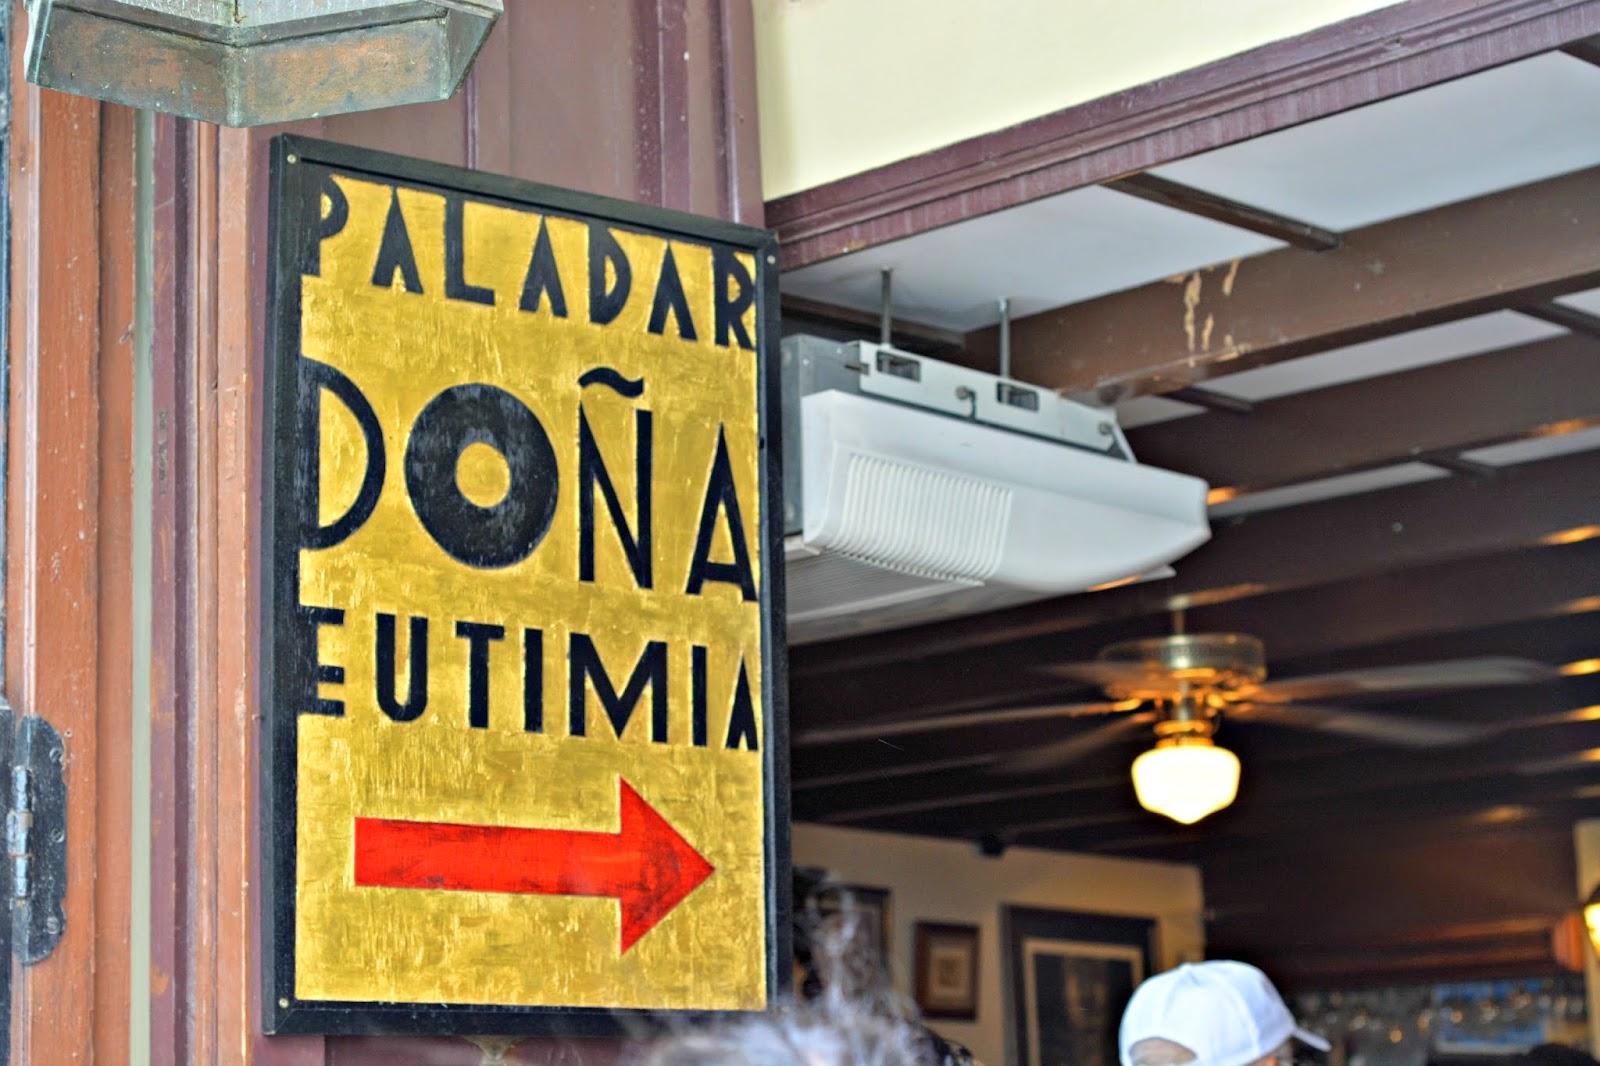 Paladar Dona Eutimia Havana Cuba